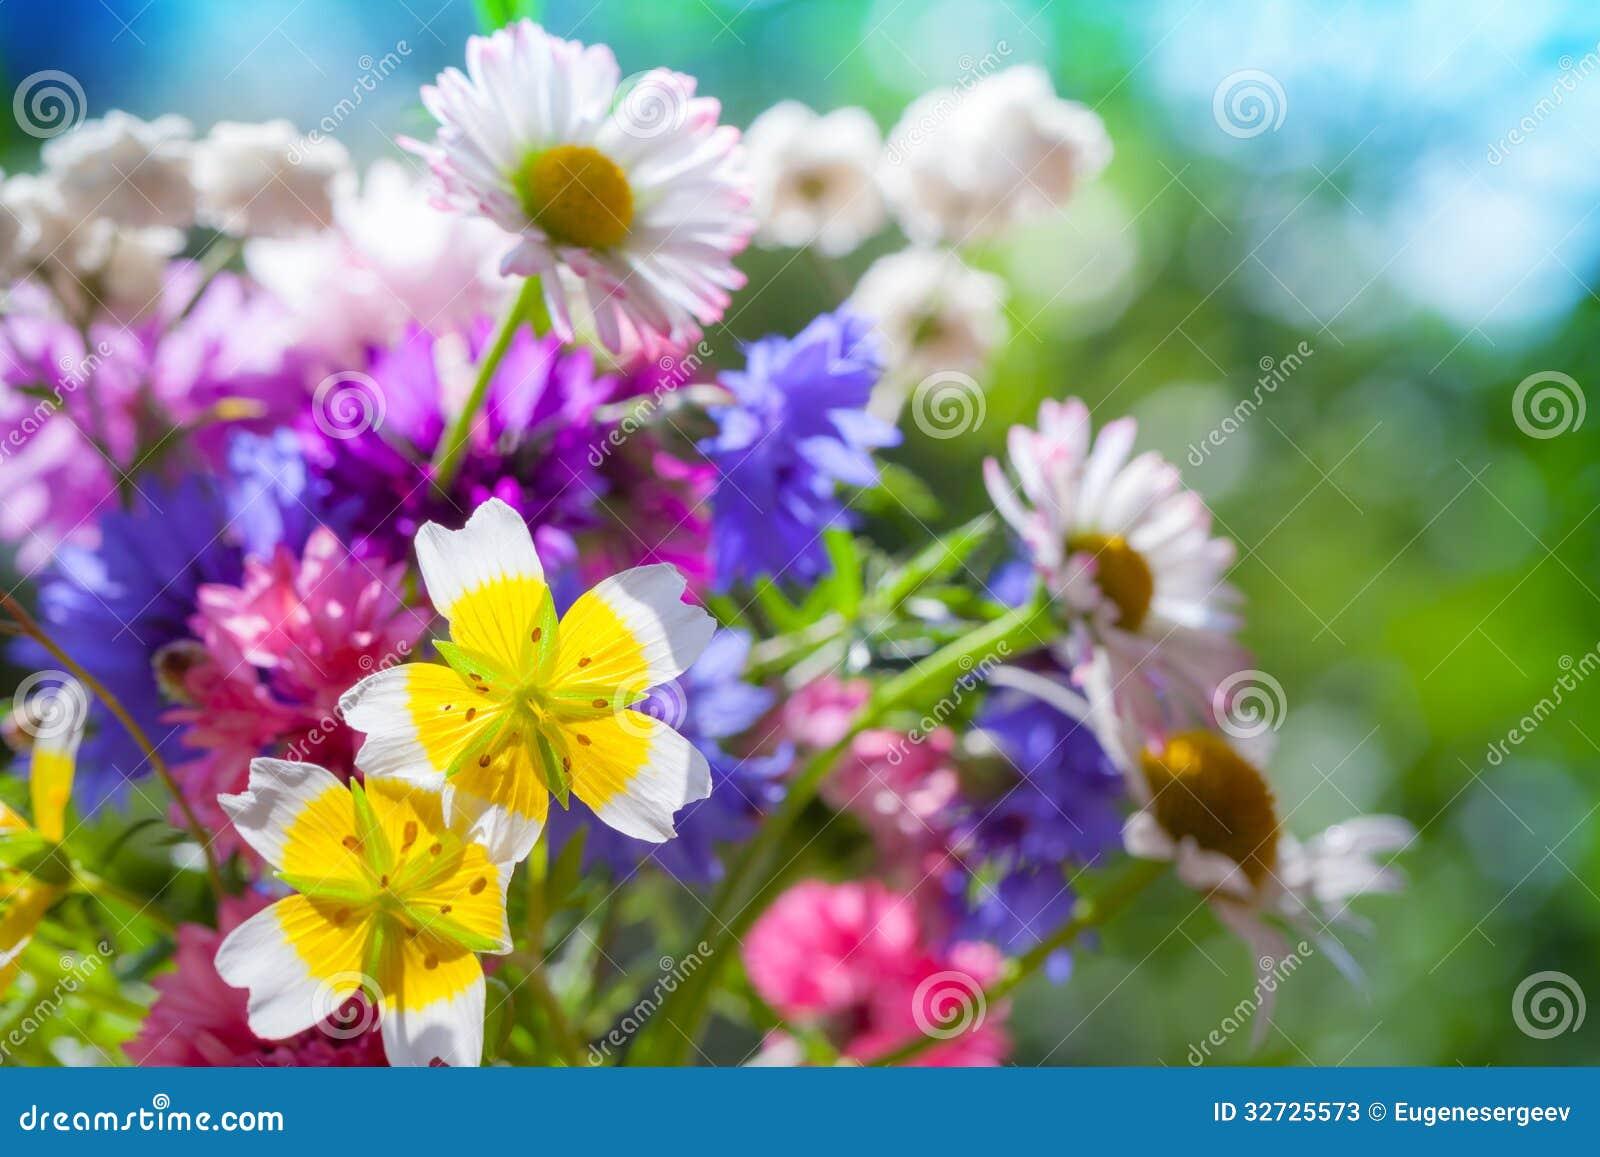 summer flower retro sunshine - photo #37